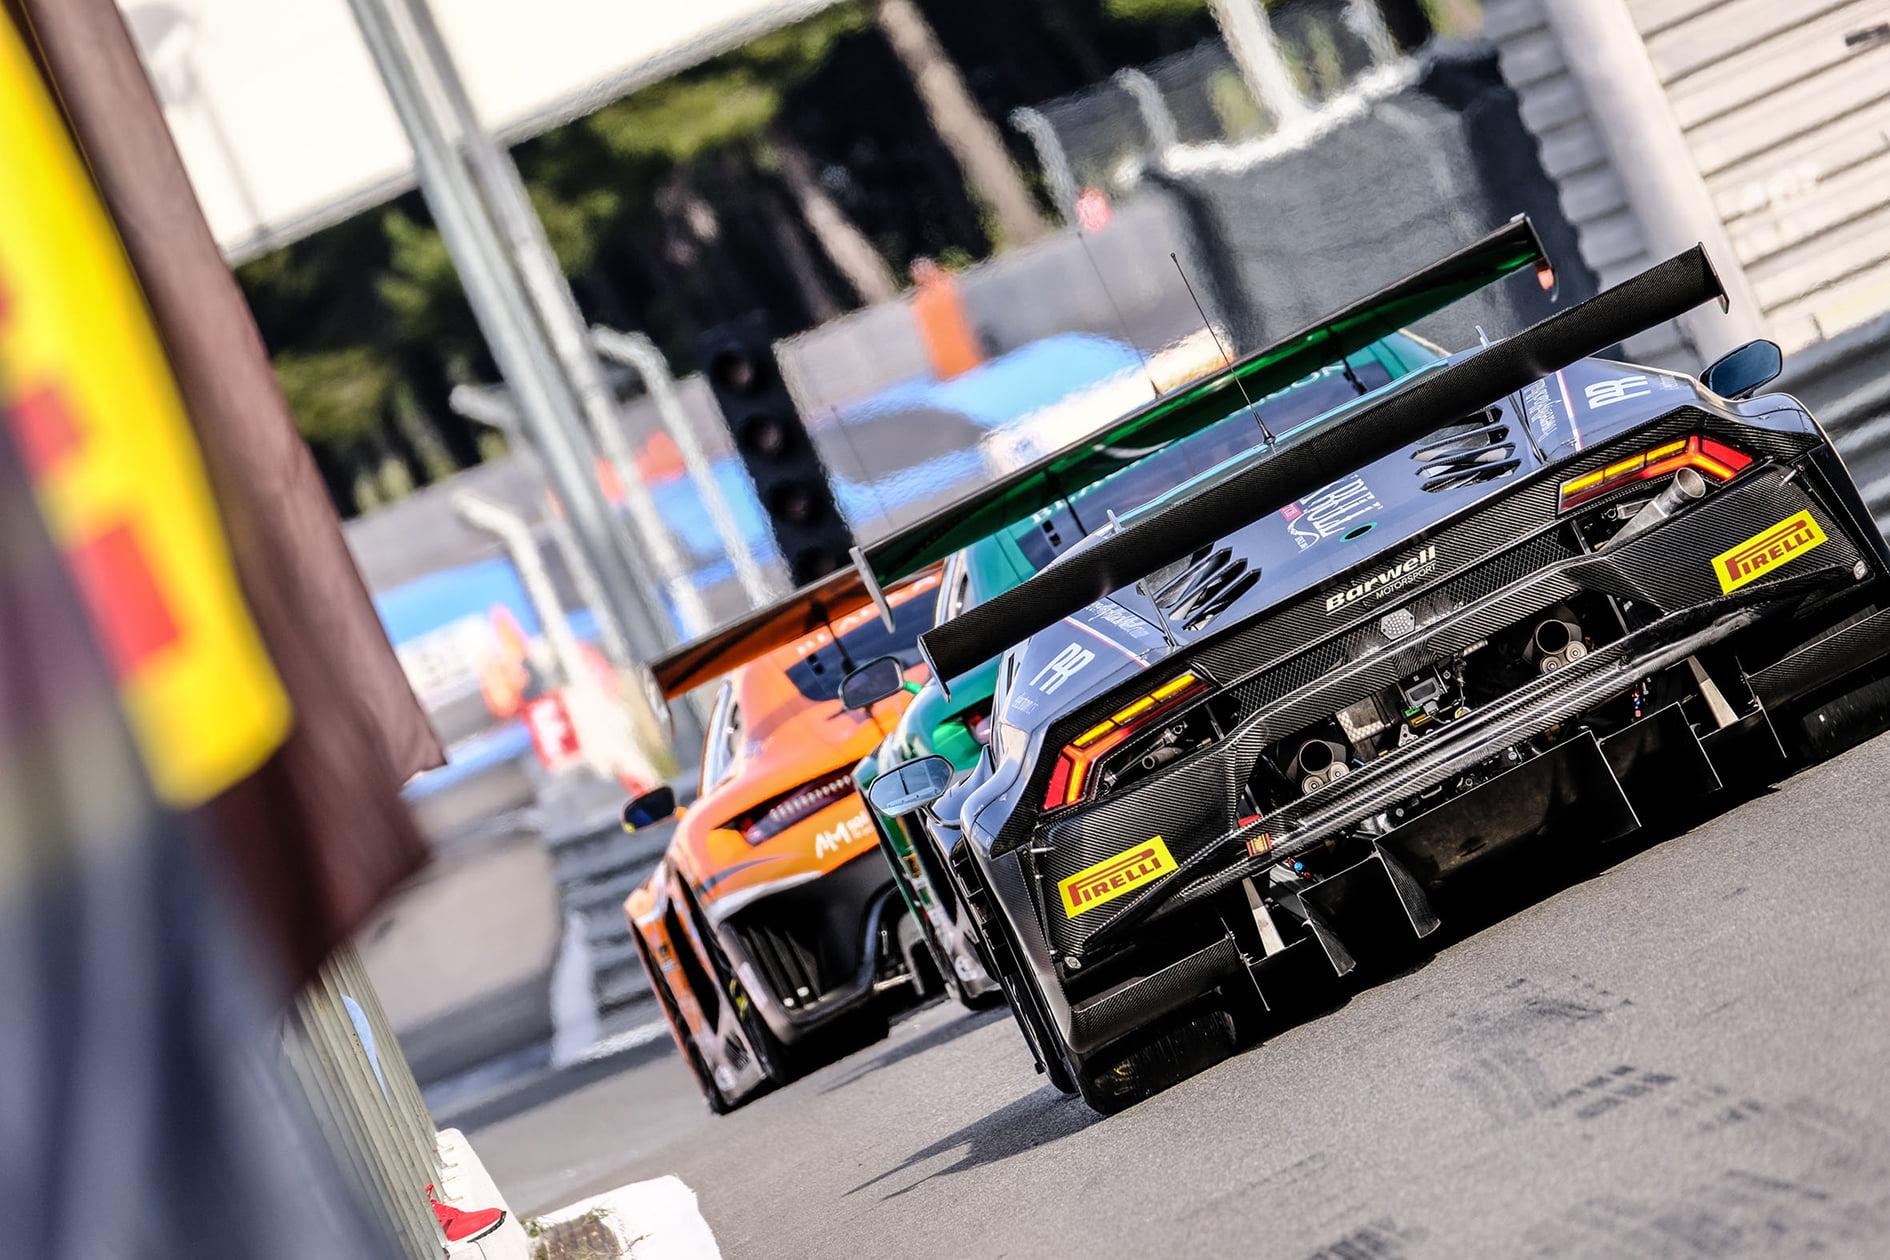 La GT World Challenge reúne a un gran número de pilotos